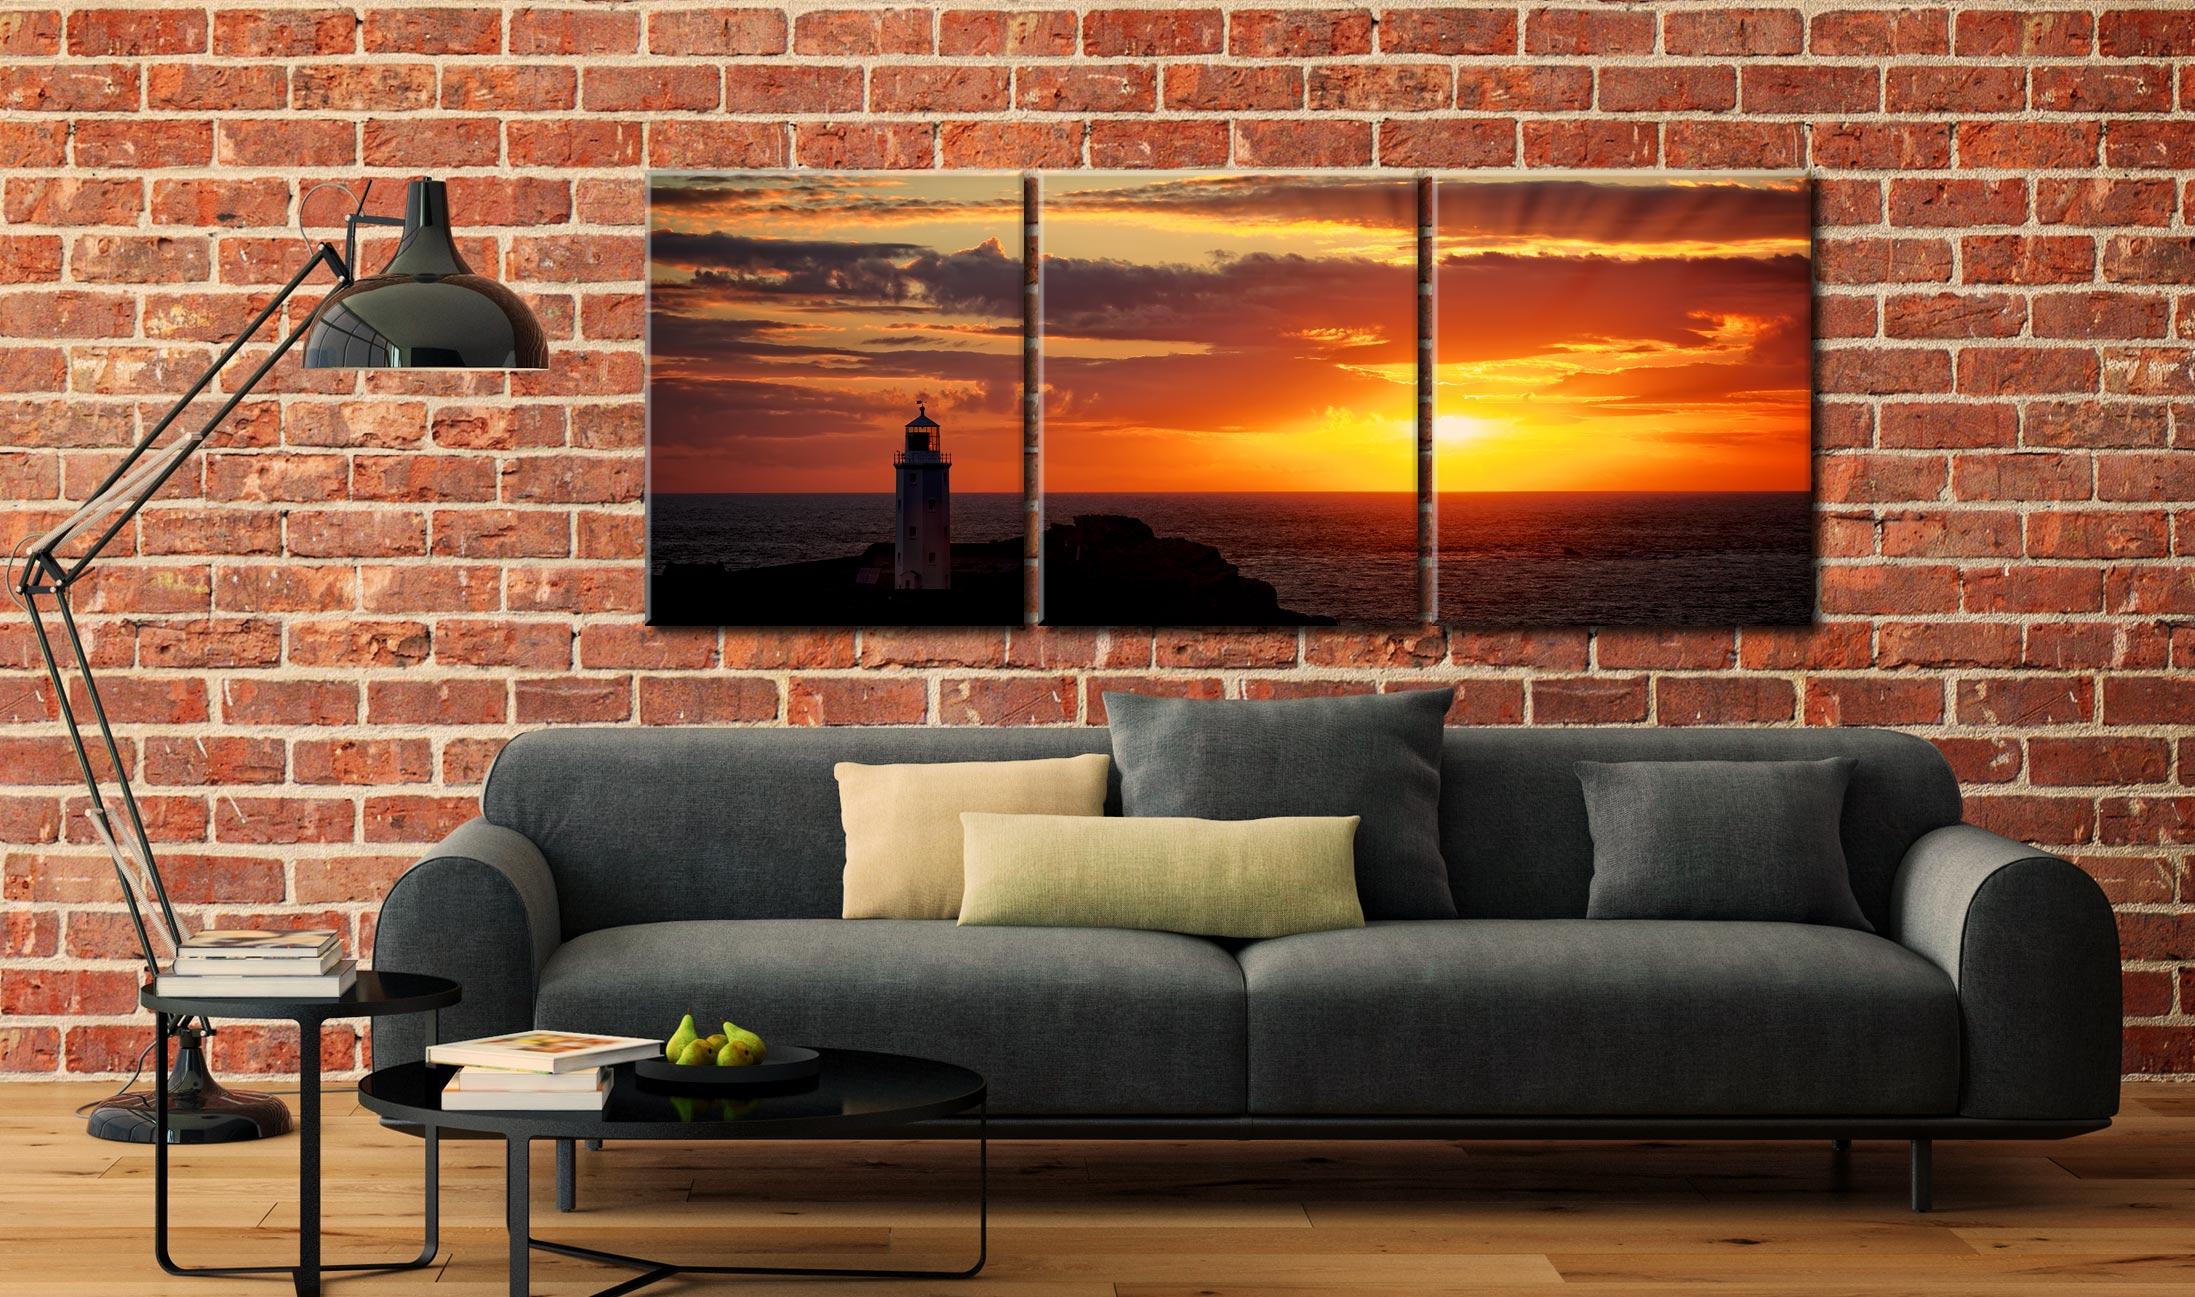 Sun Rays Over Godrevy Lighthouse - 3 Panel Canvas on Wall